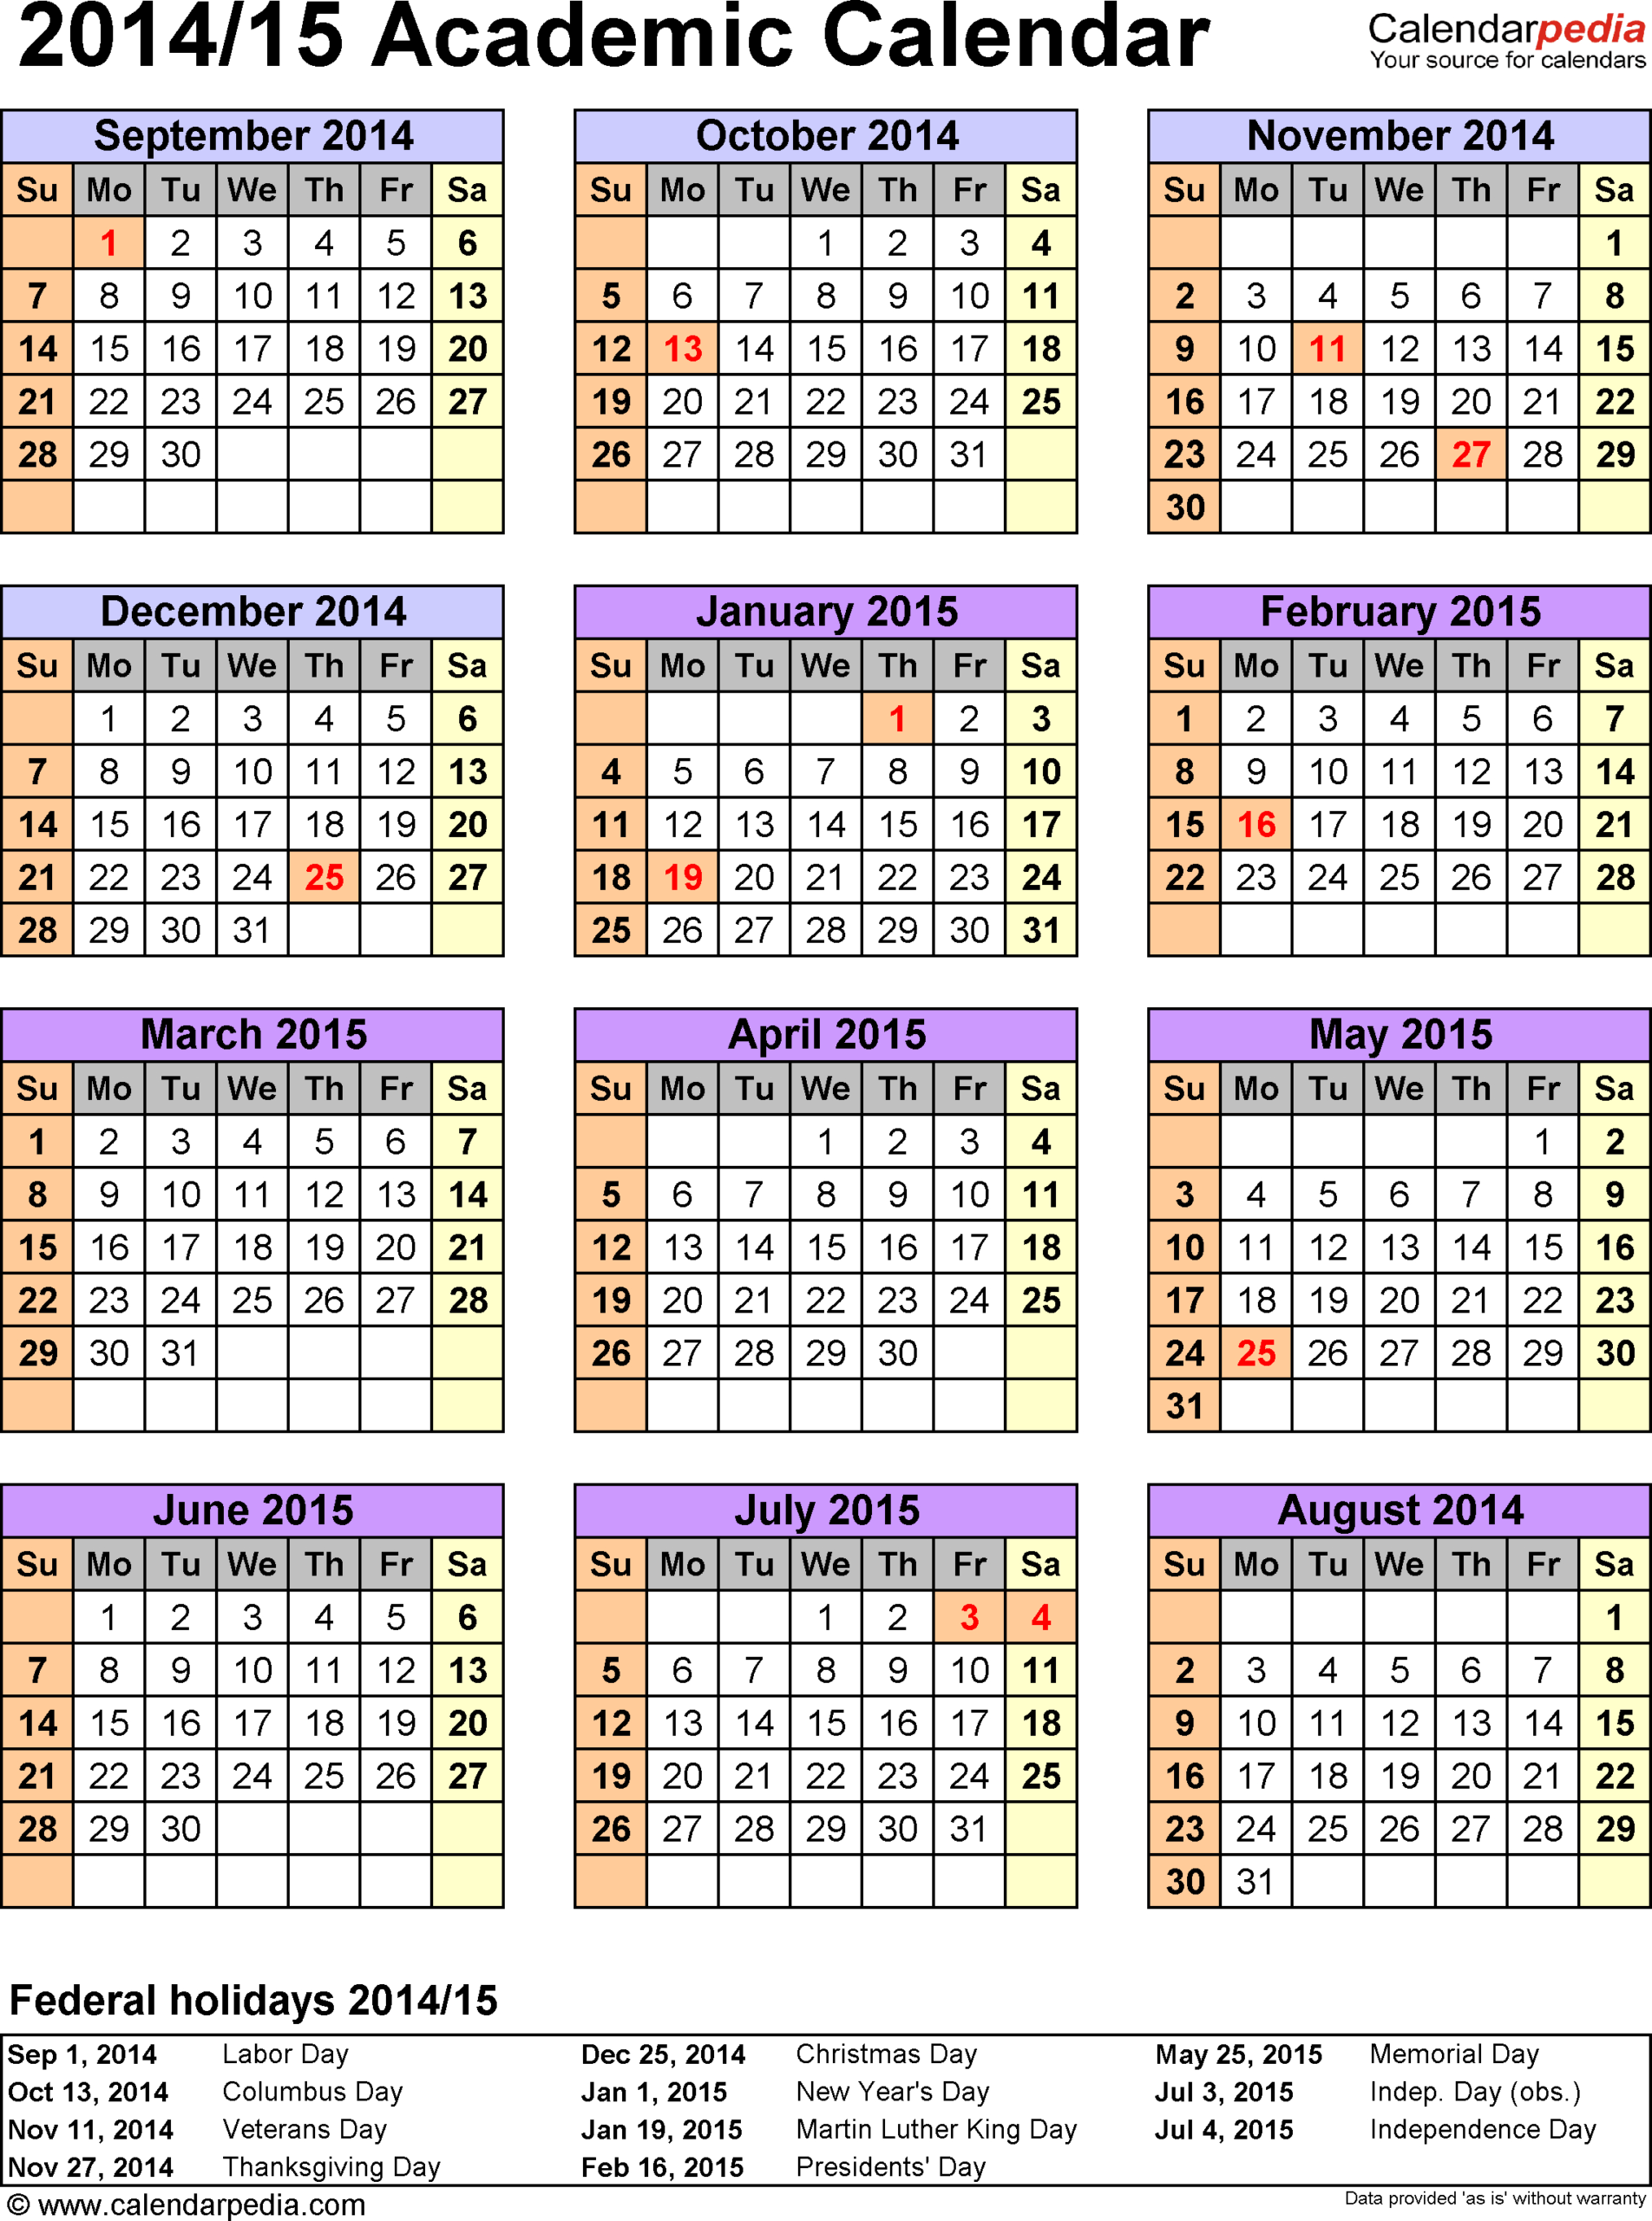 Yangah Solen: Nyc Doe Calendar With Regard To 2015 Doe School Calendar - Printable Calendar 2020 intended for Calendar Department Of Education